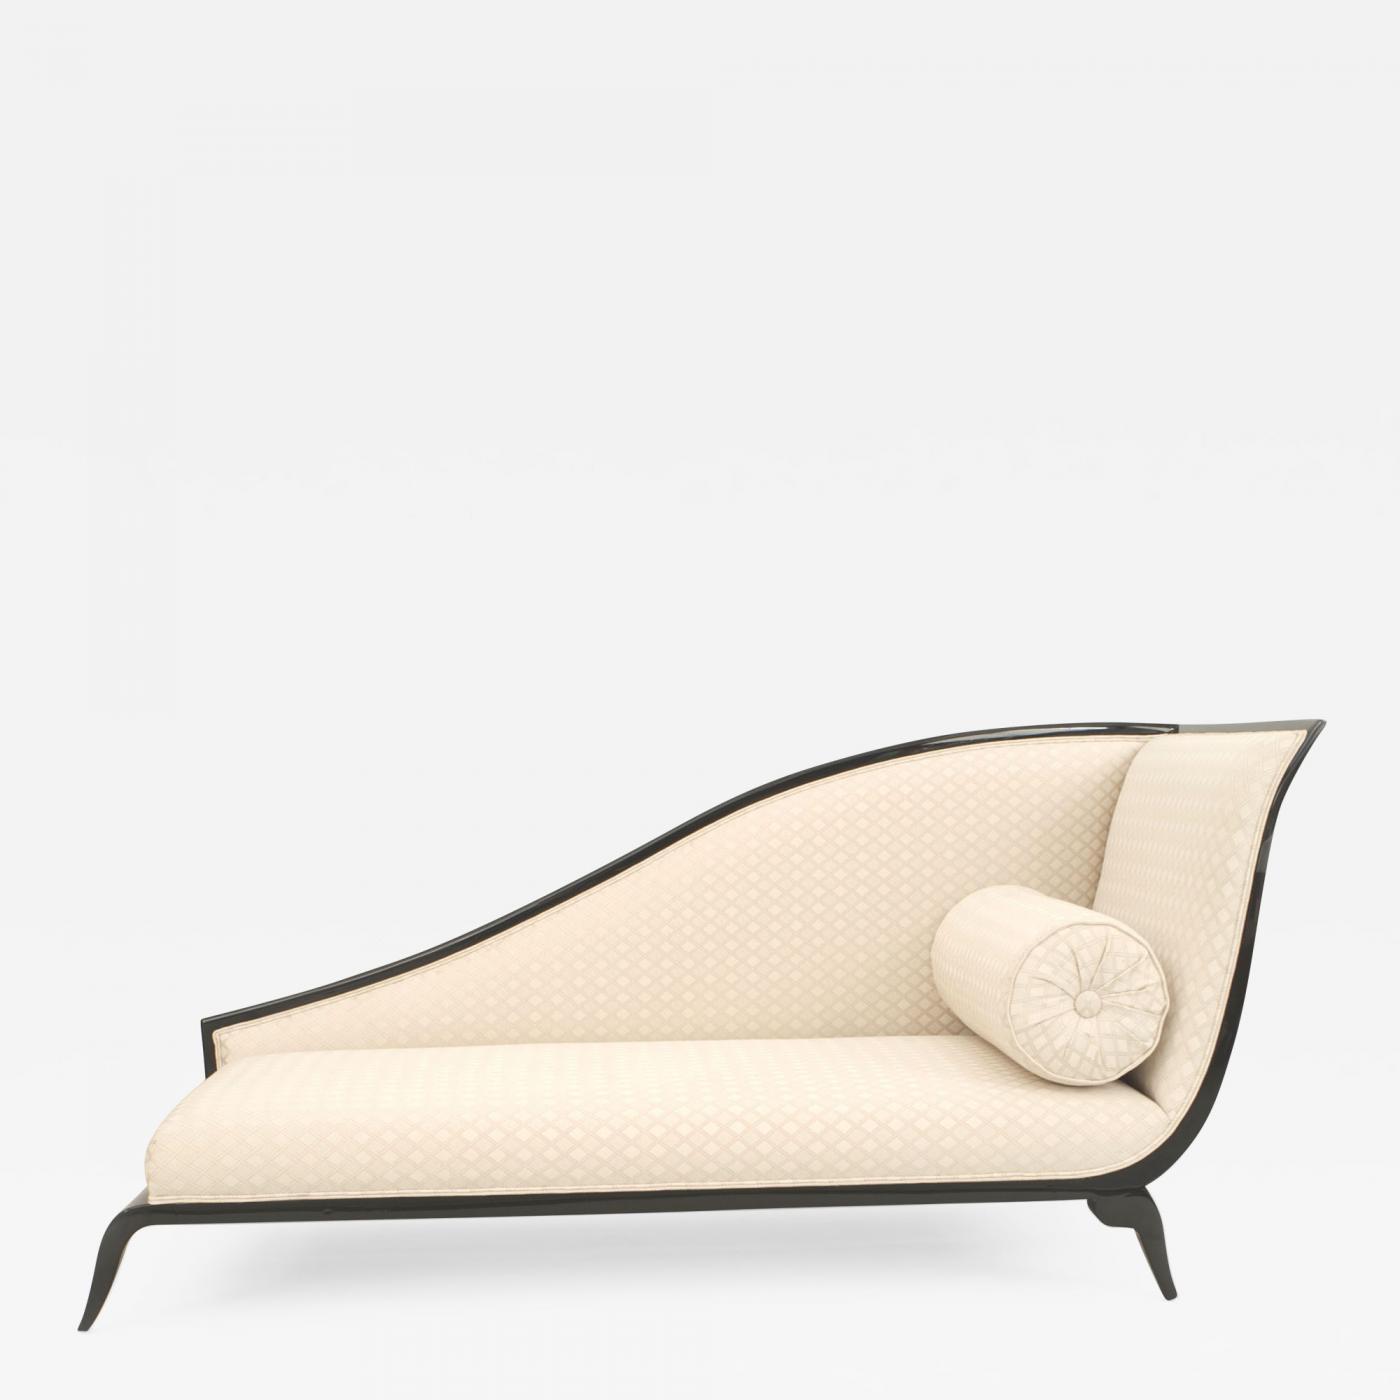 French Art Deco Style Sleigh Back Recamier